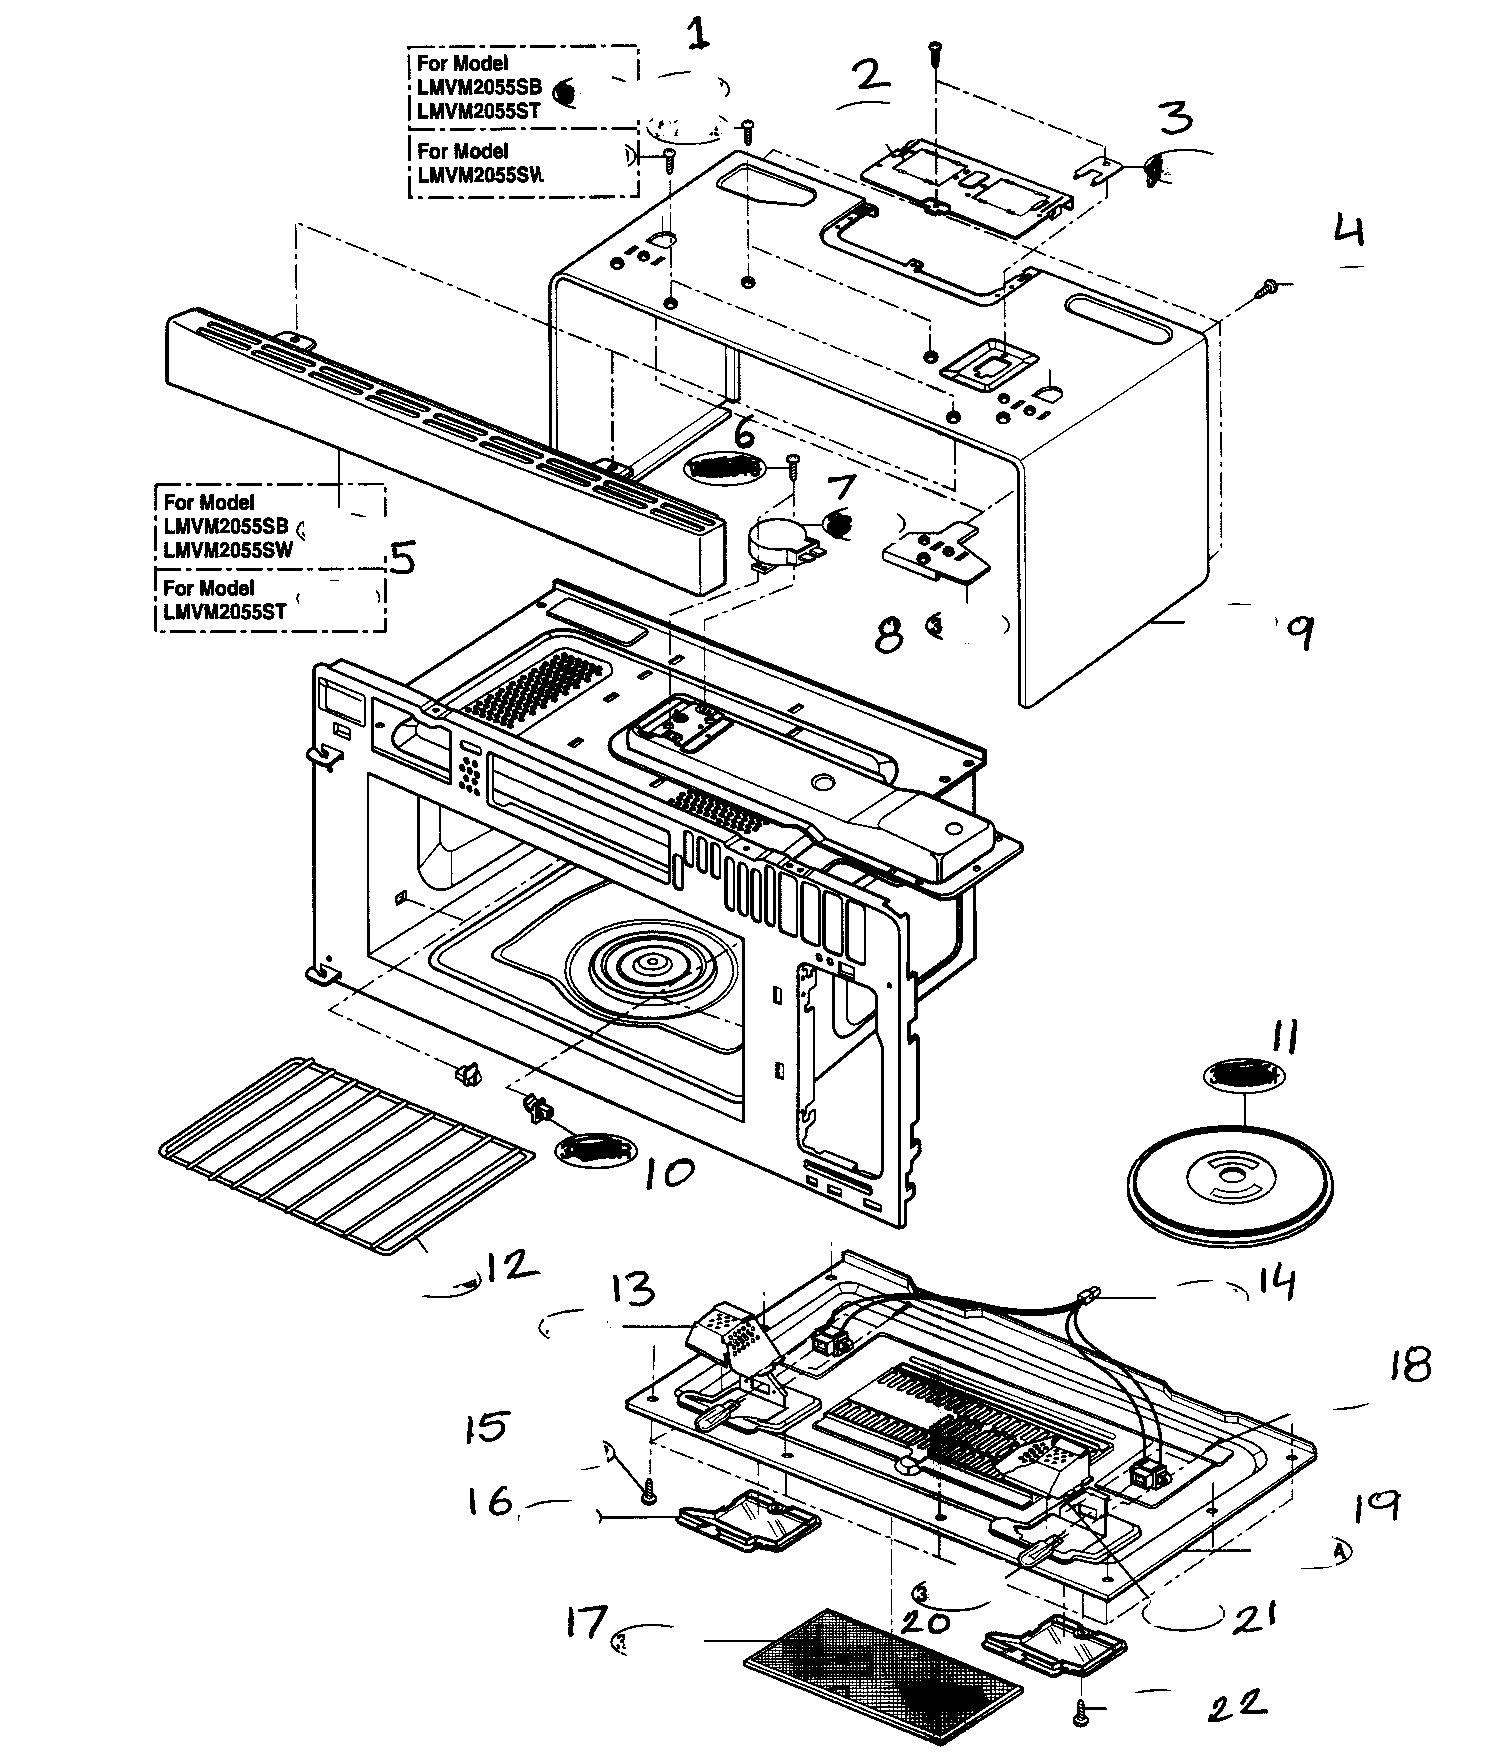 Parts For Lg Microwave Bestmicrowave Lmv1680st Oven Wiring Diagram Model Lmvm2055st Hood Combo Genuine